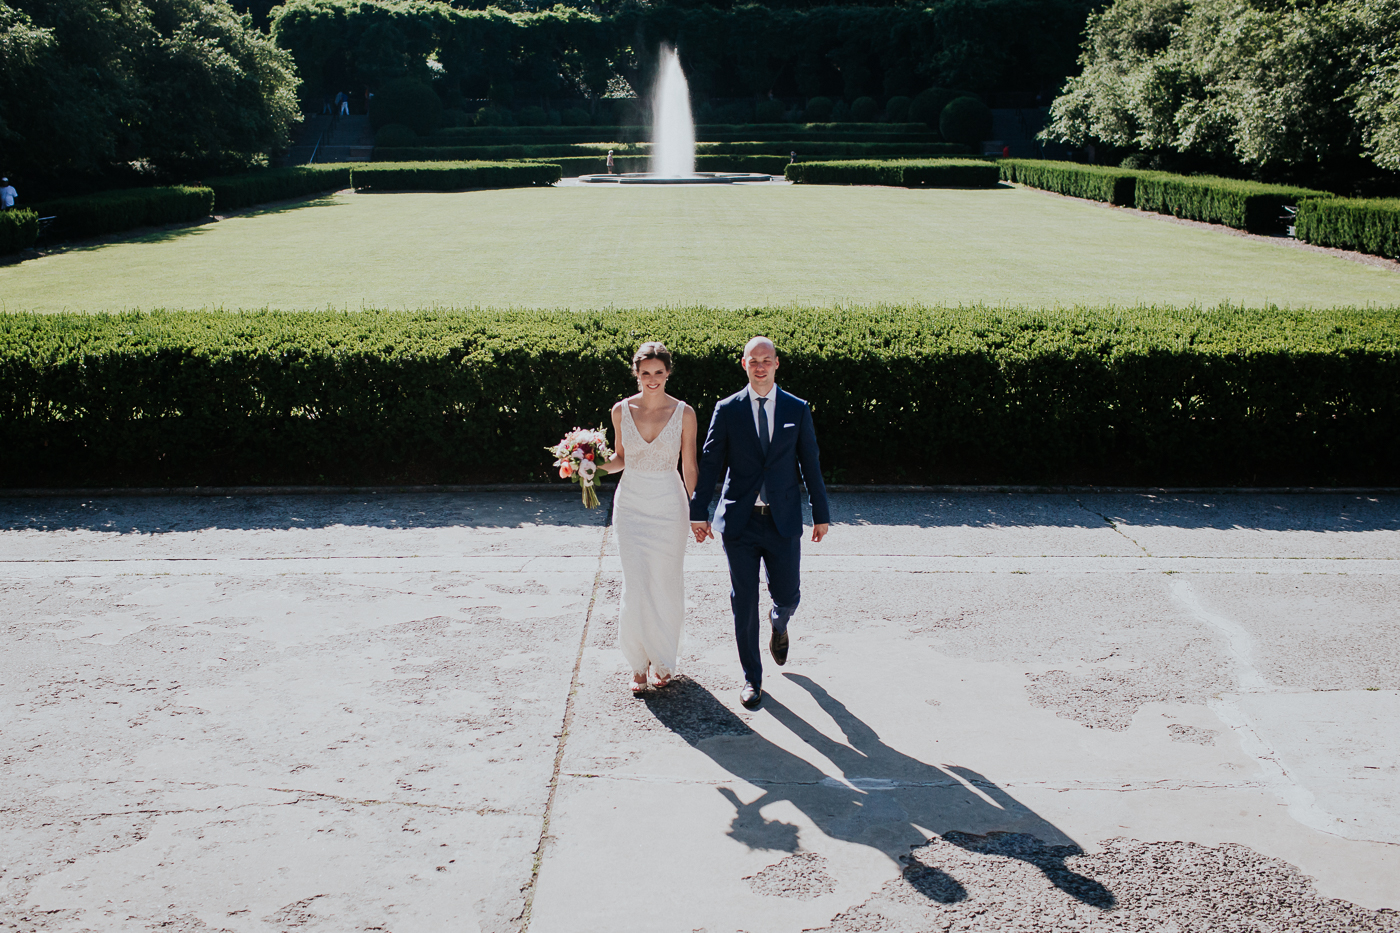 NYC-Central-Park-Conservatory-Garden-Intimate-Elopement-Documentary-Wedding-Photographer-45.jpg